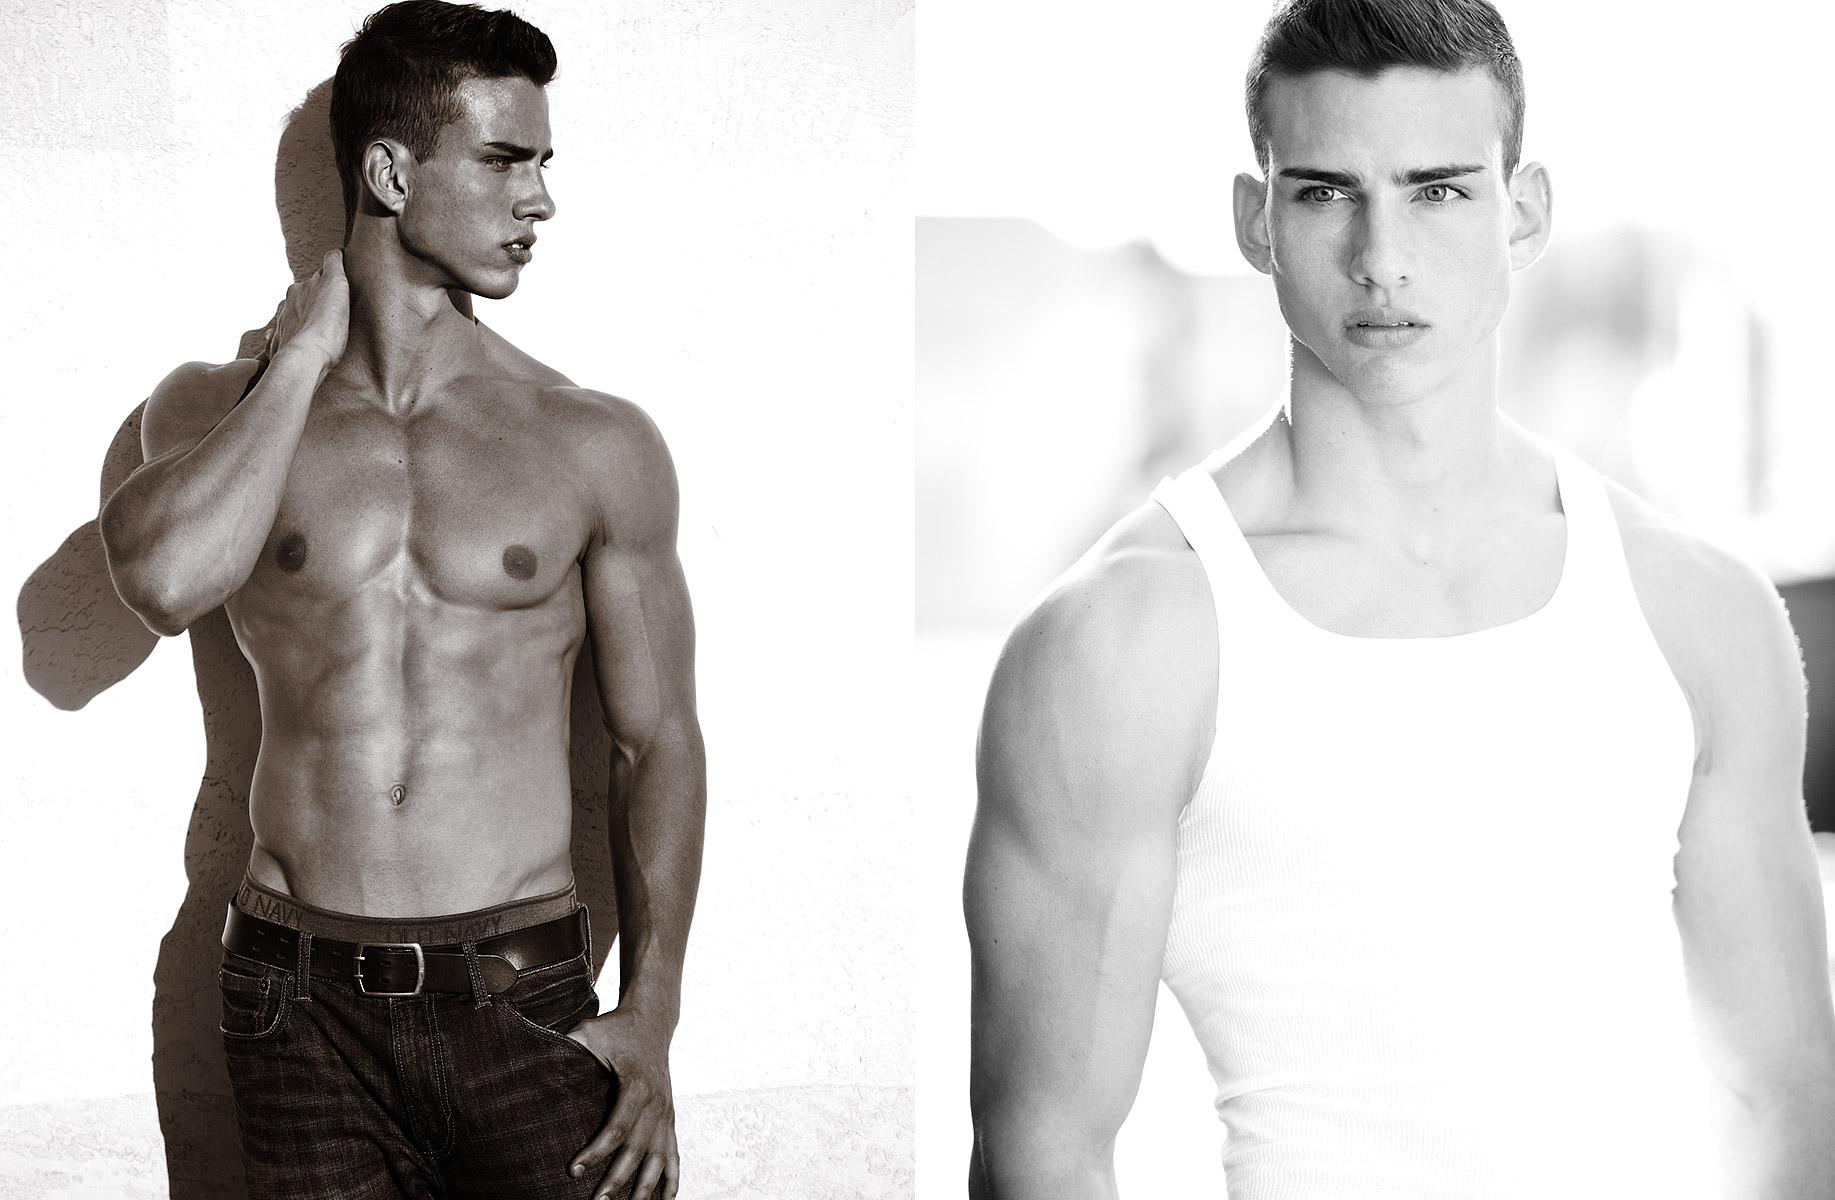 new-mexico-albuquerque-male-models-men-9.jpg